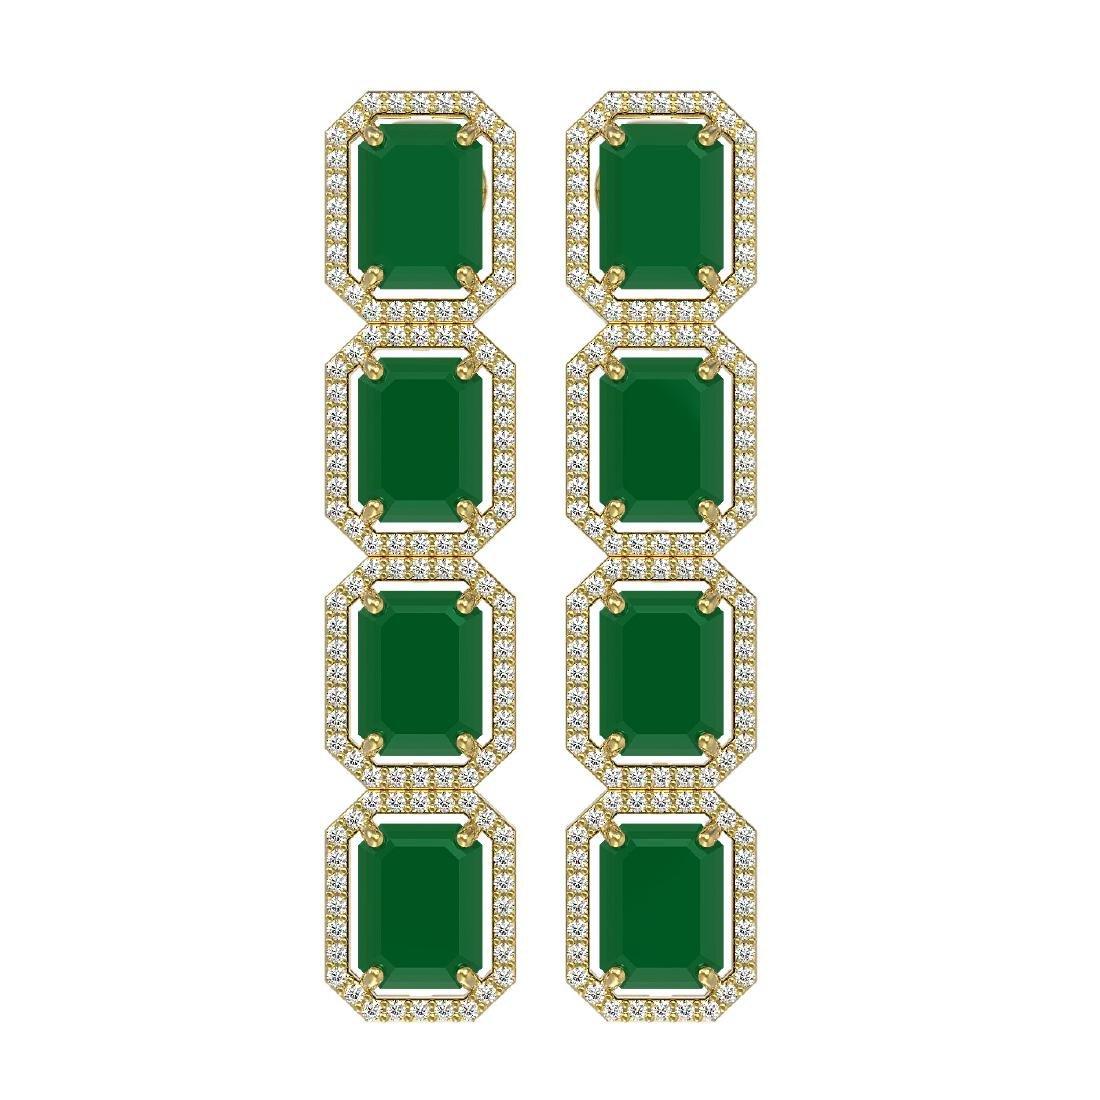 20.59 CTW Emerald & Diamond Halo Earrings 10K Yellow